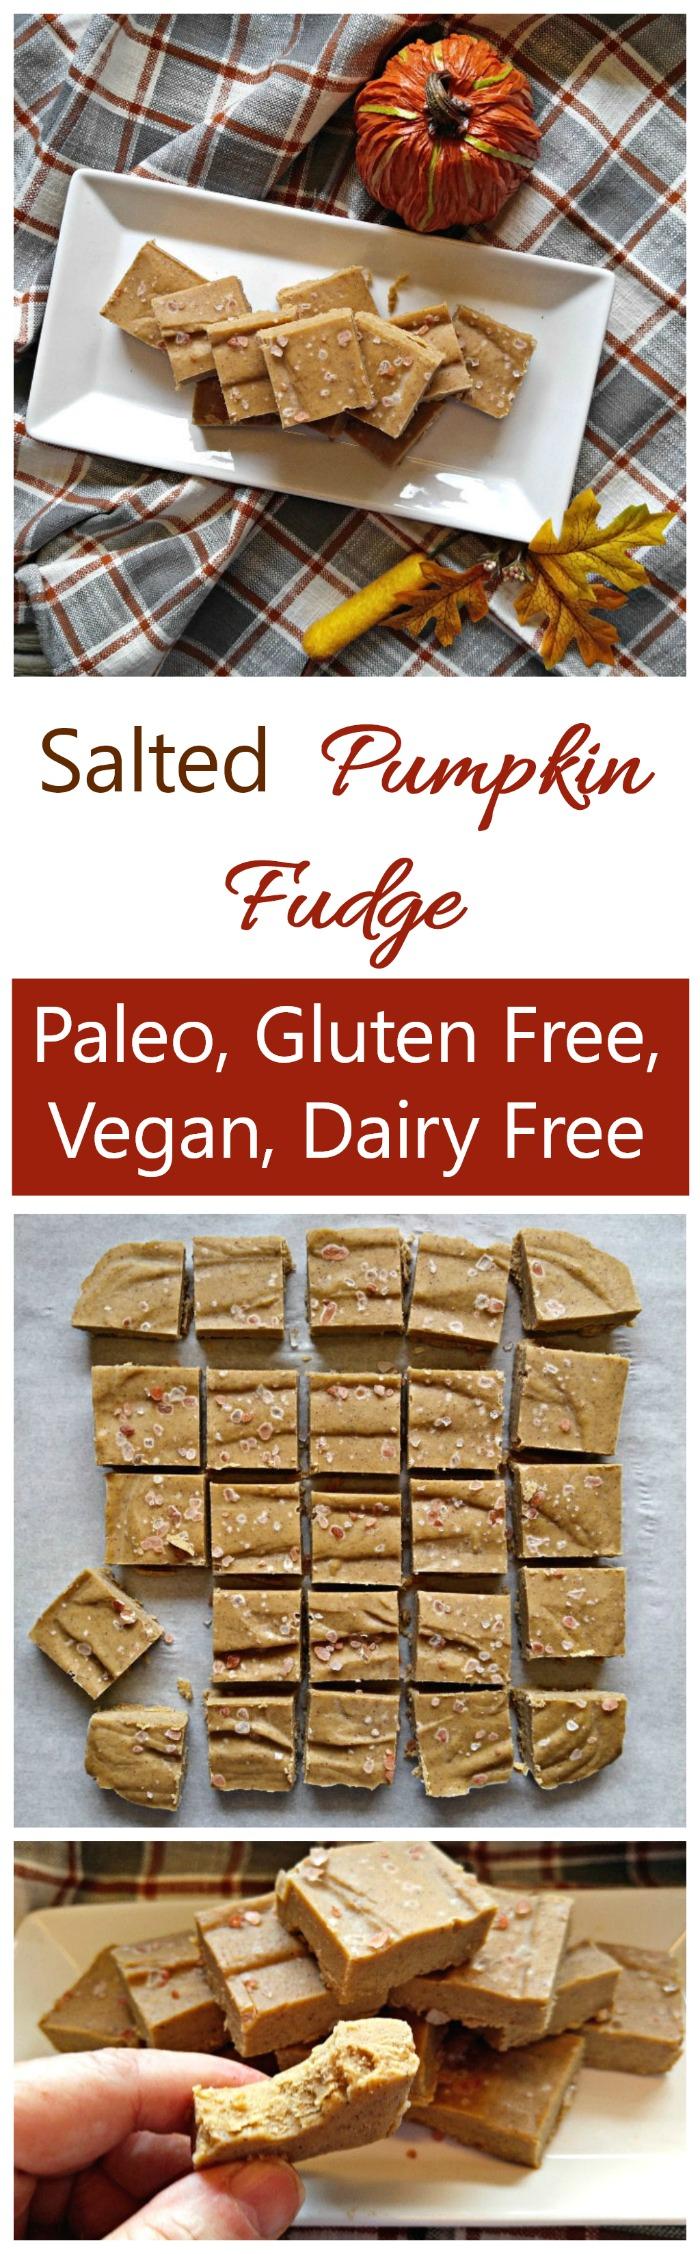 Pumpkin Fudge - Vegan and Paleo Treat